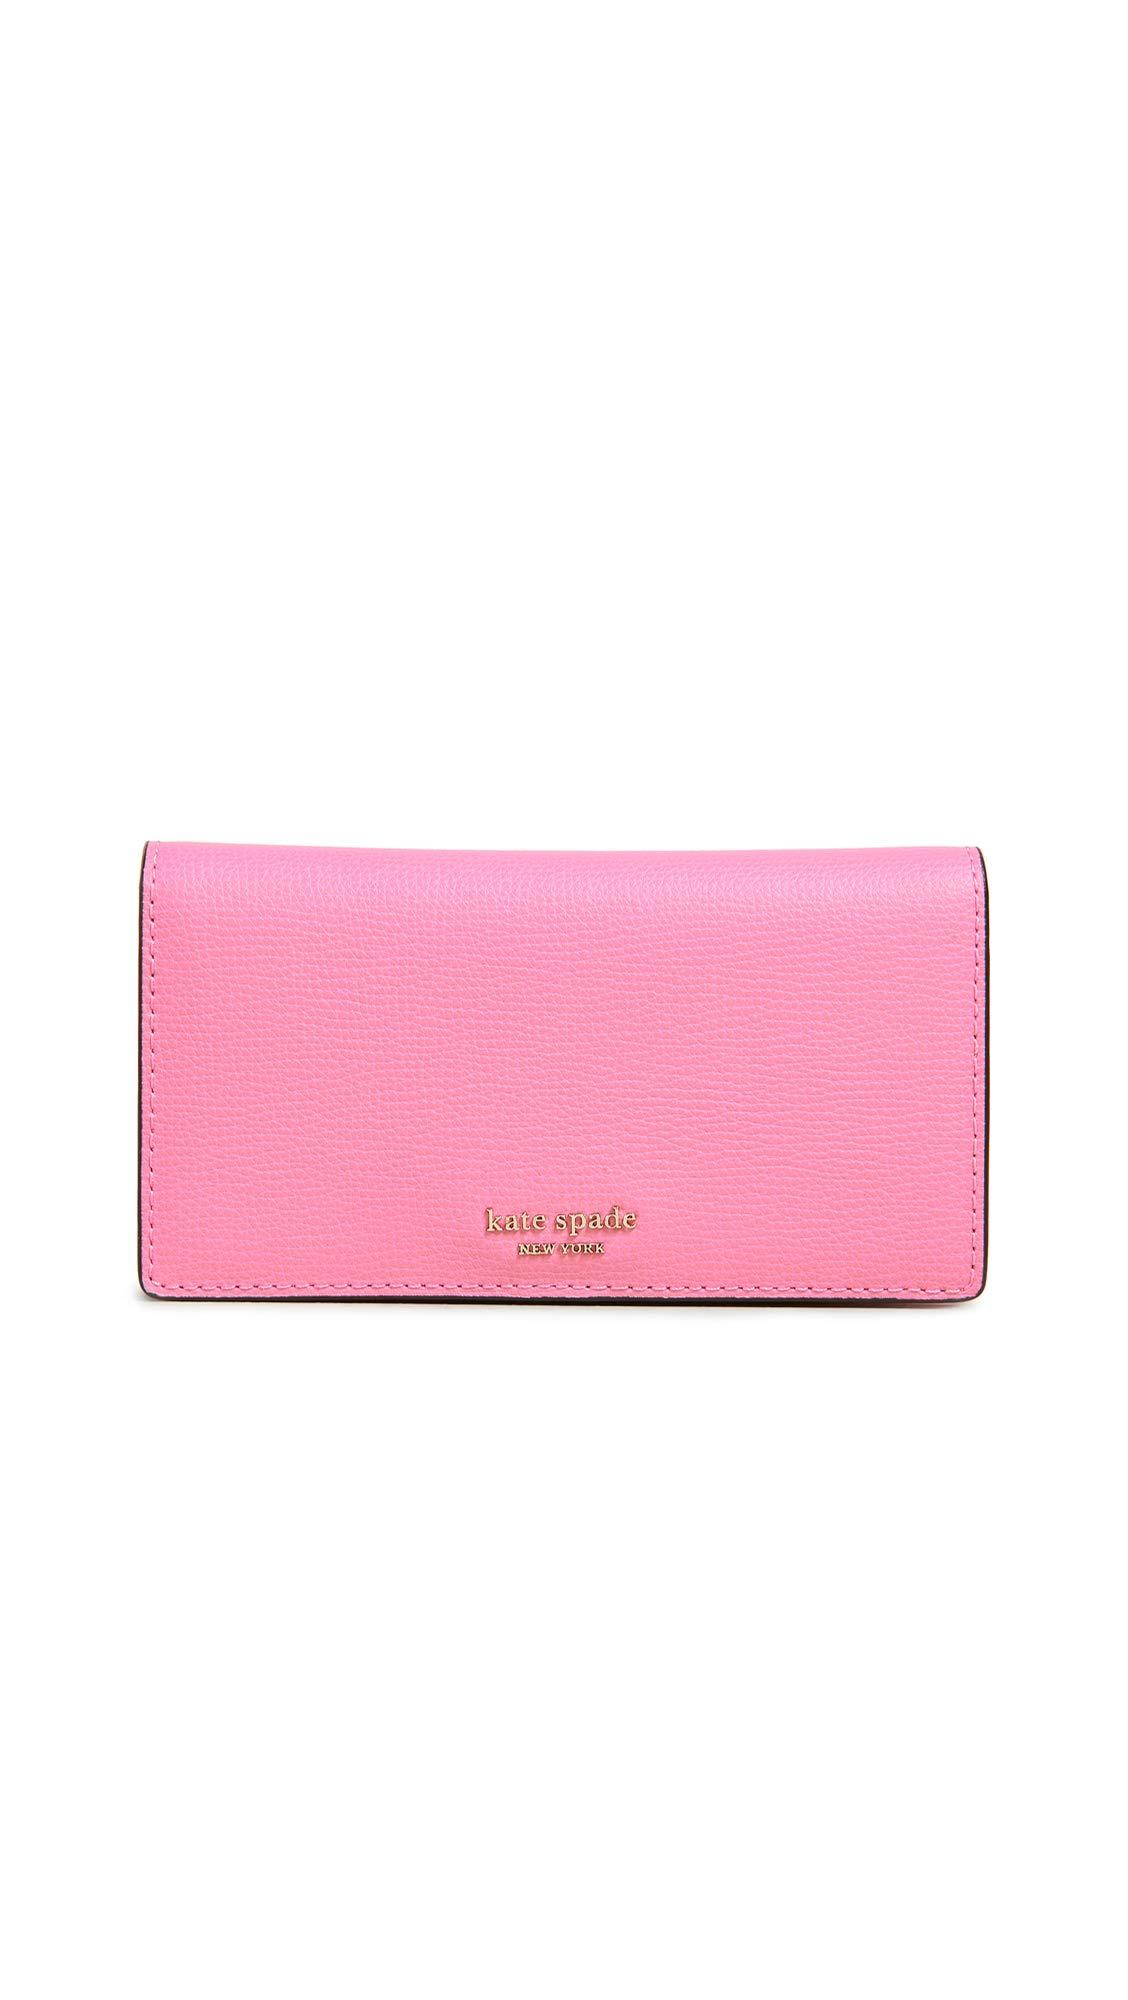 Kate Spade New York Women's Sylvia Medium Bifold With Card Holder, Hibiscus Tea, Pink, One Size